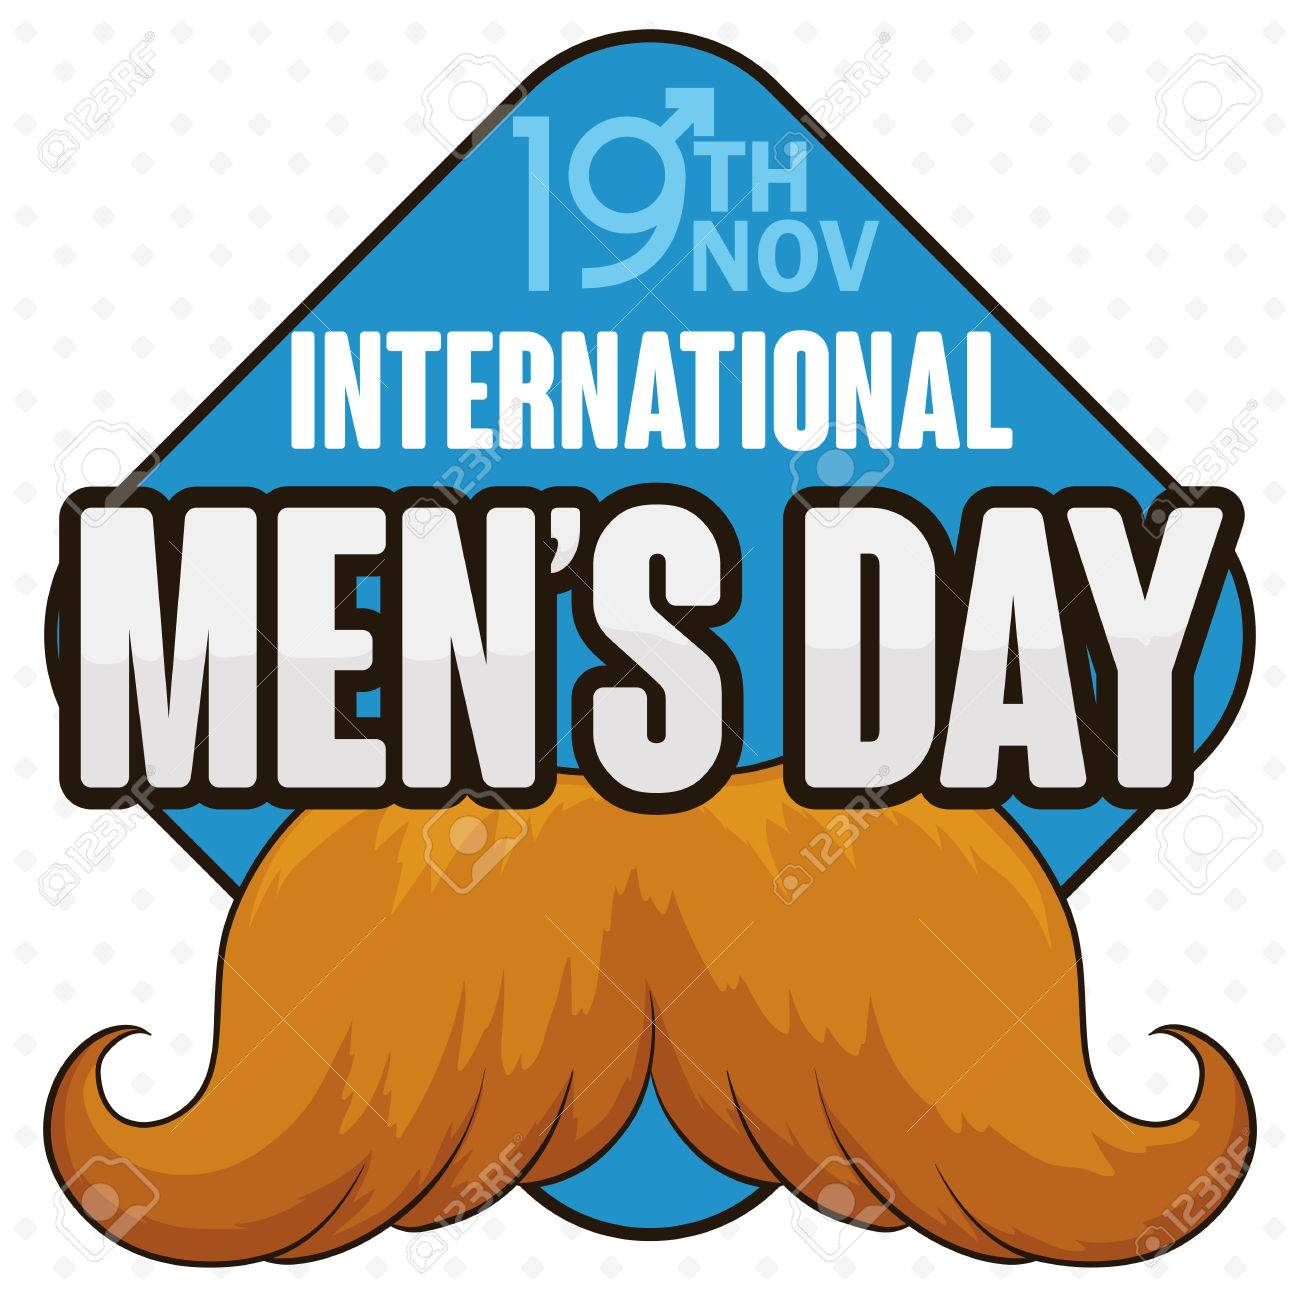 dating international mens day november